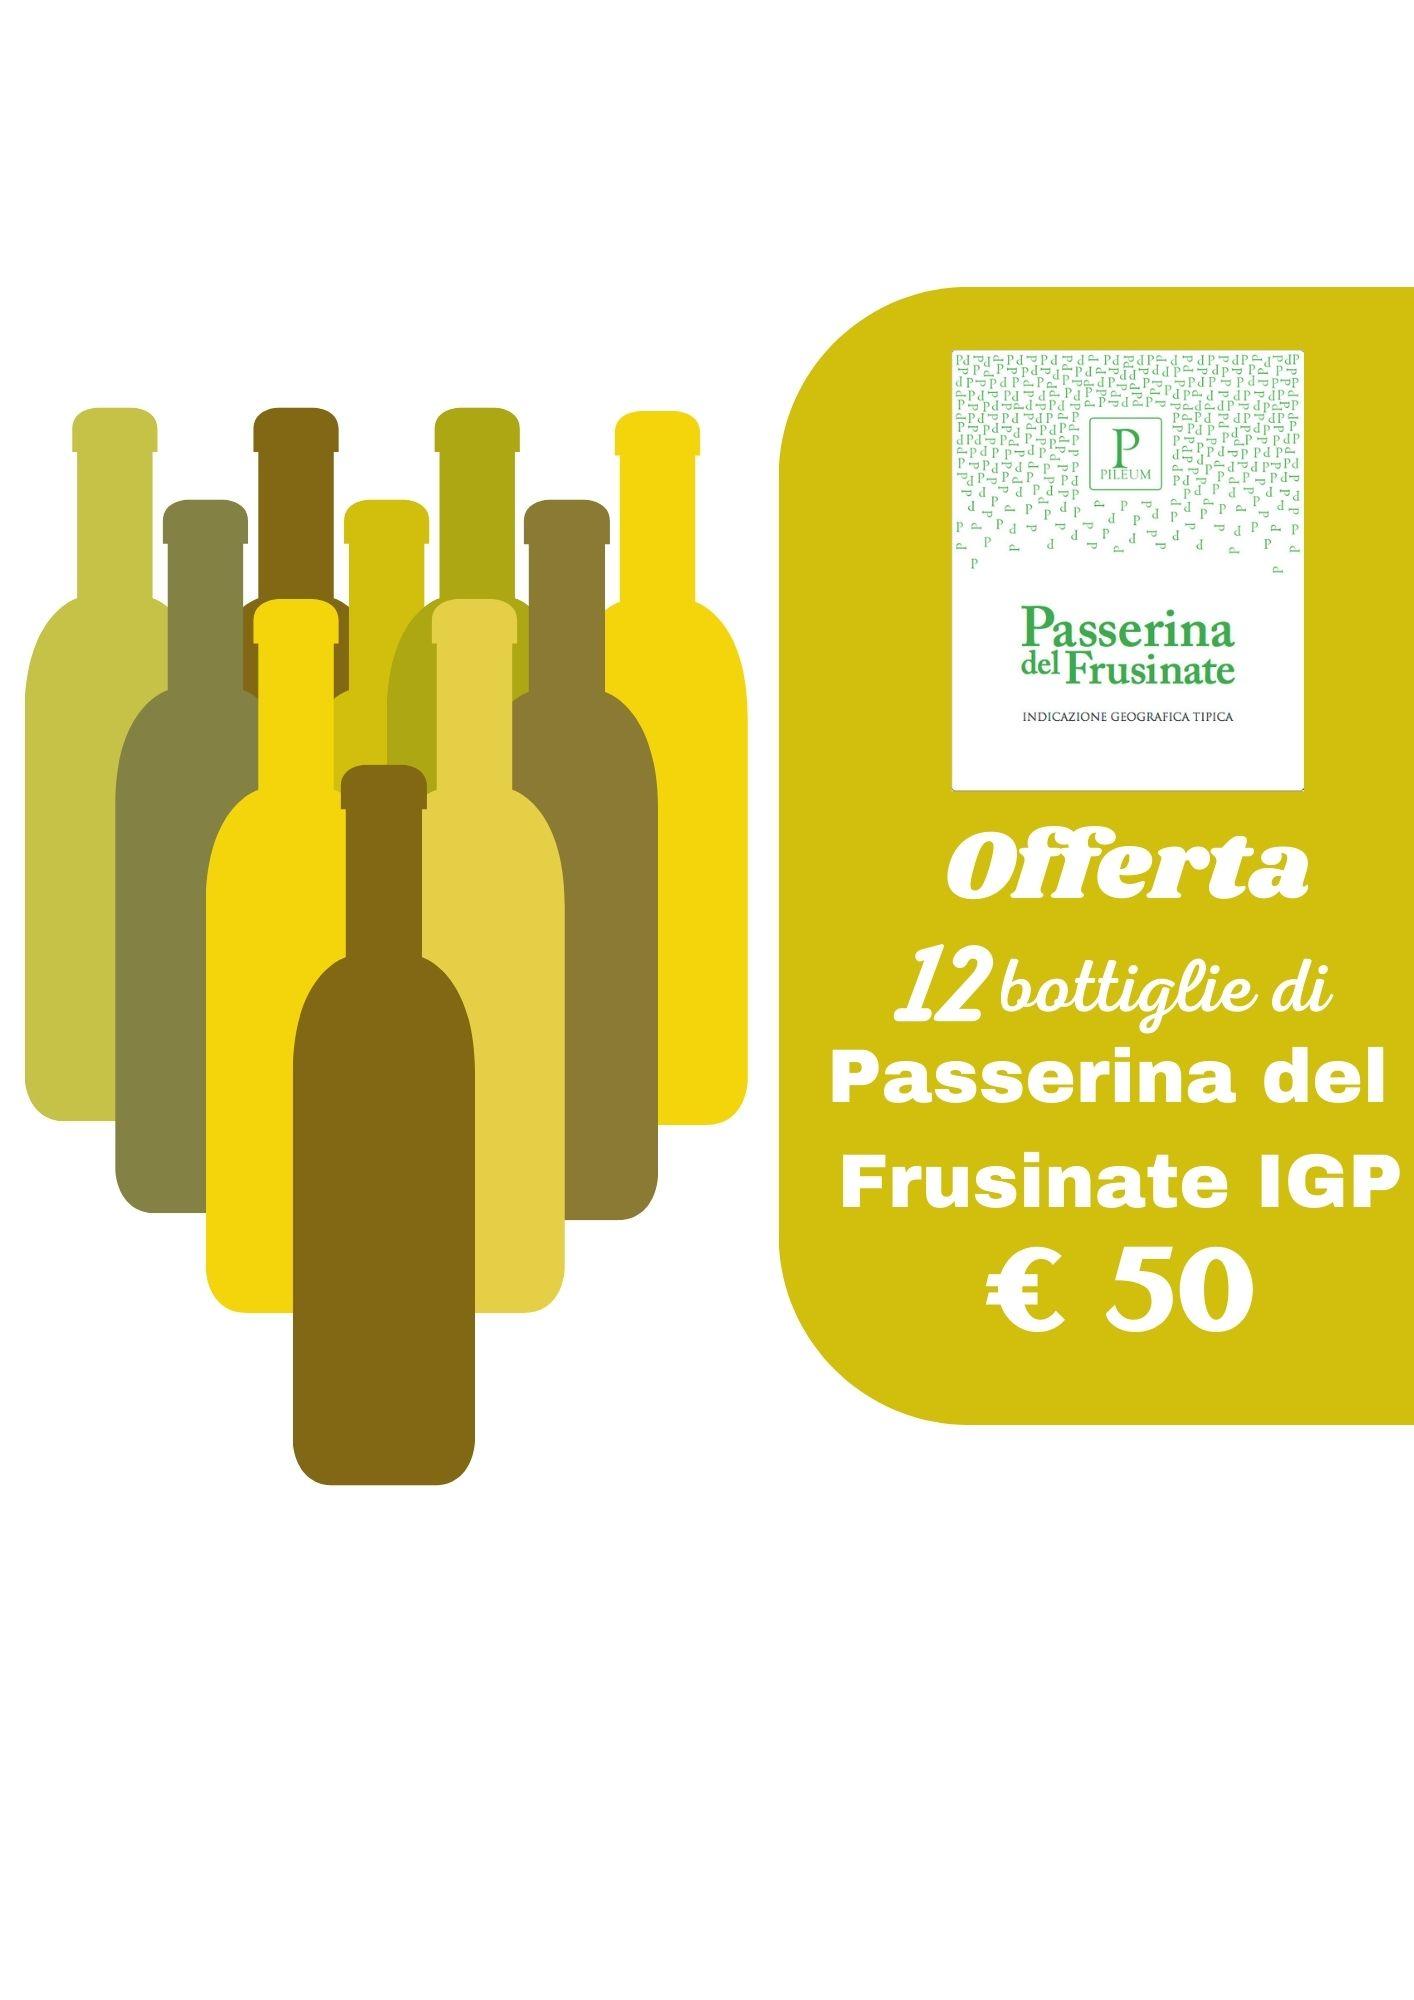 Offerta N.12 bottiglie Passerina del Frusinate Pileum